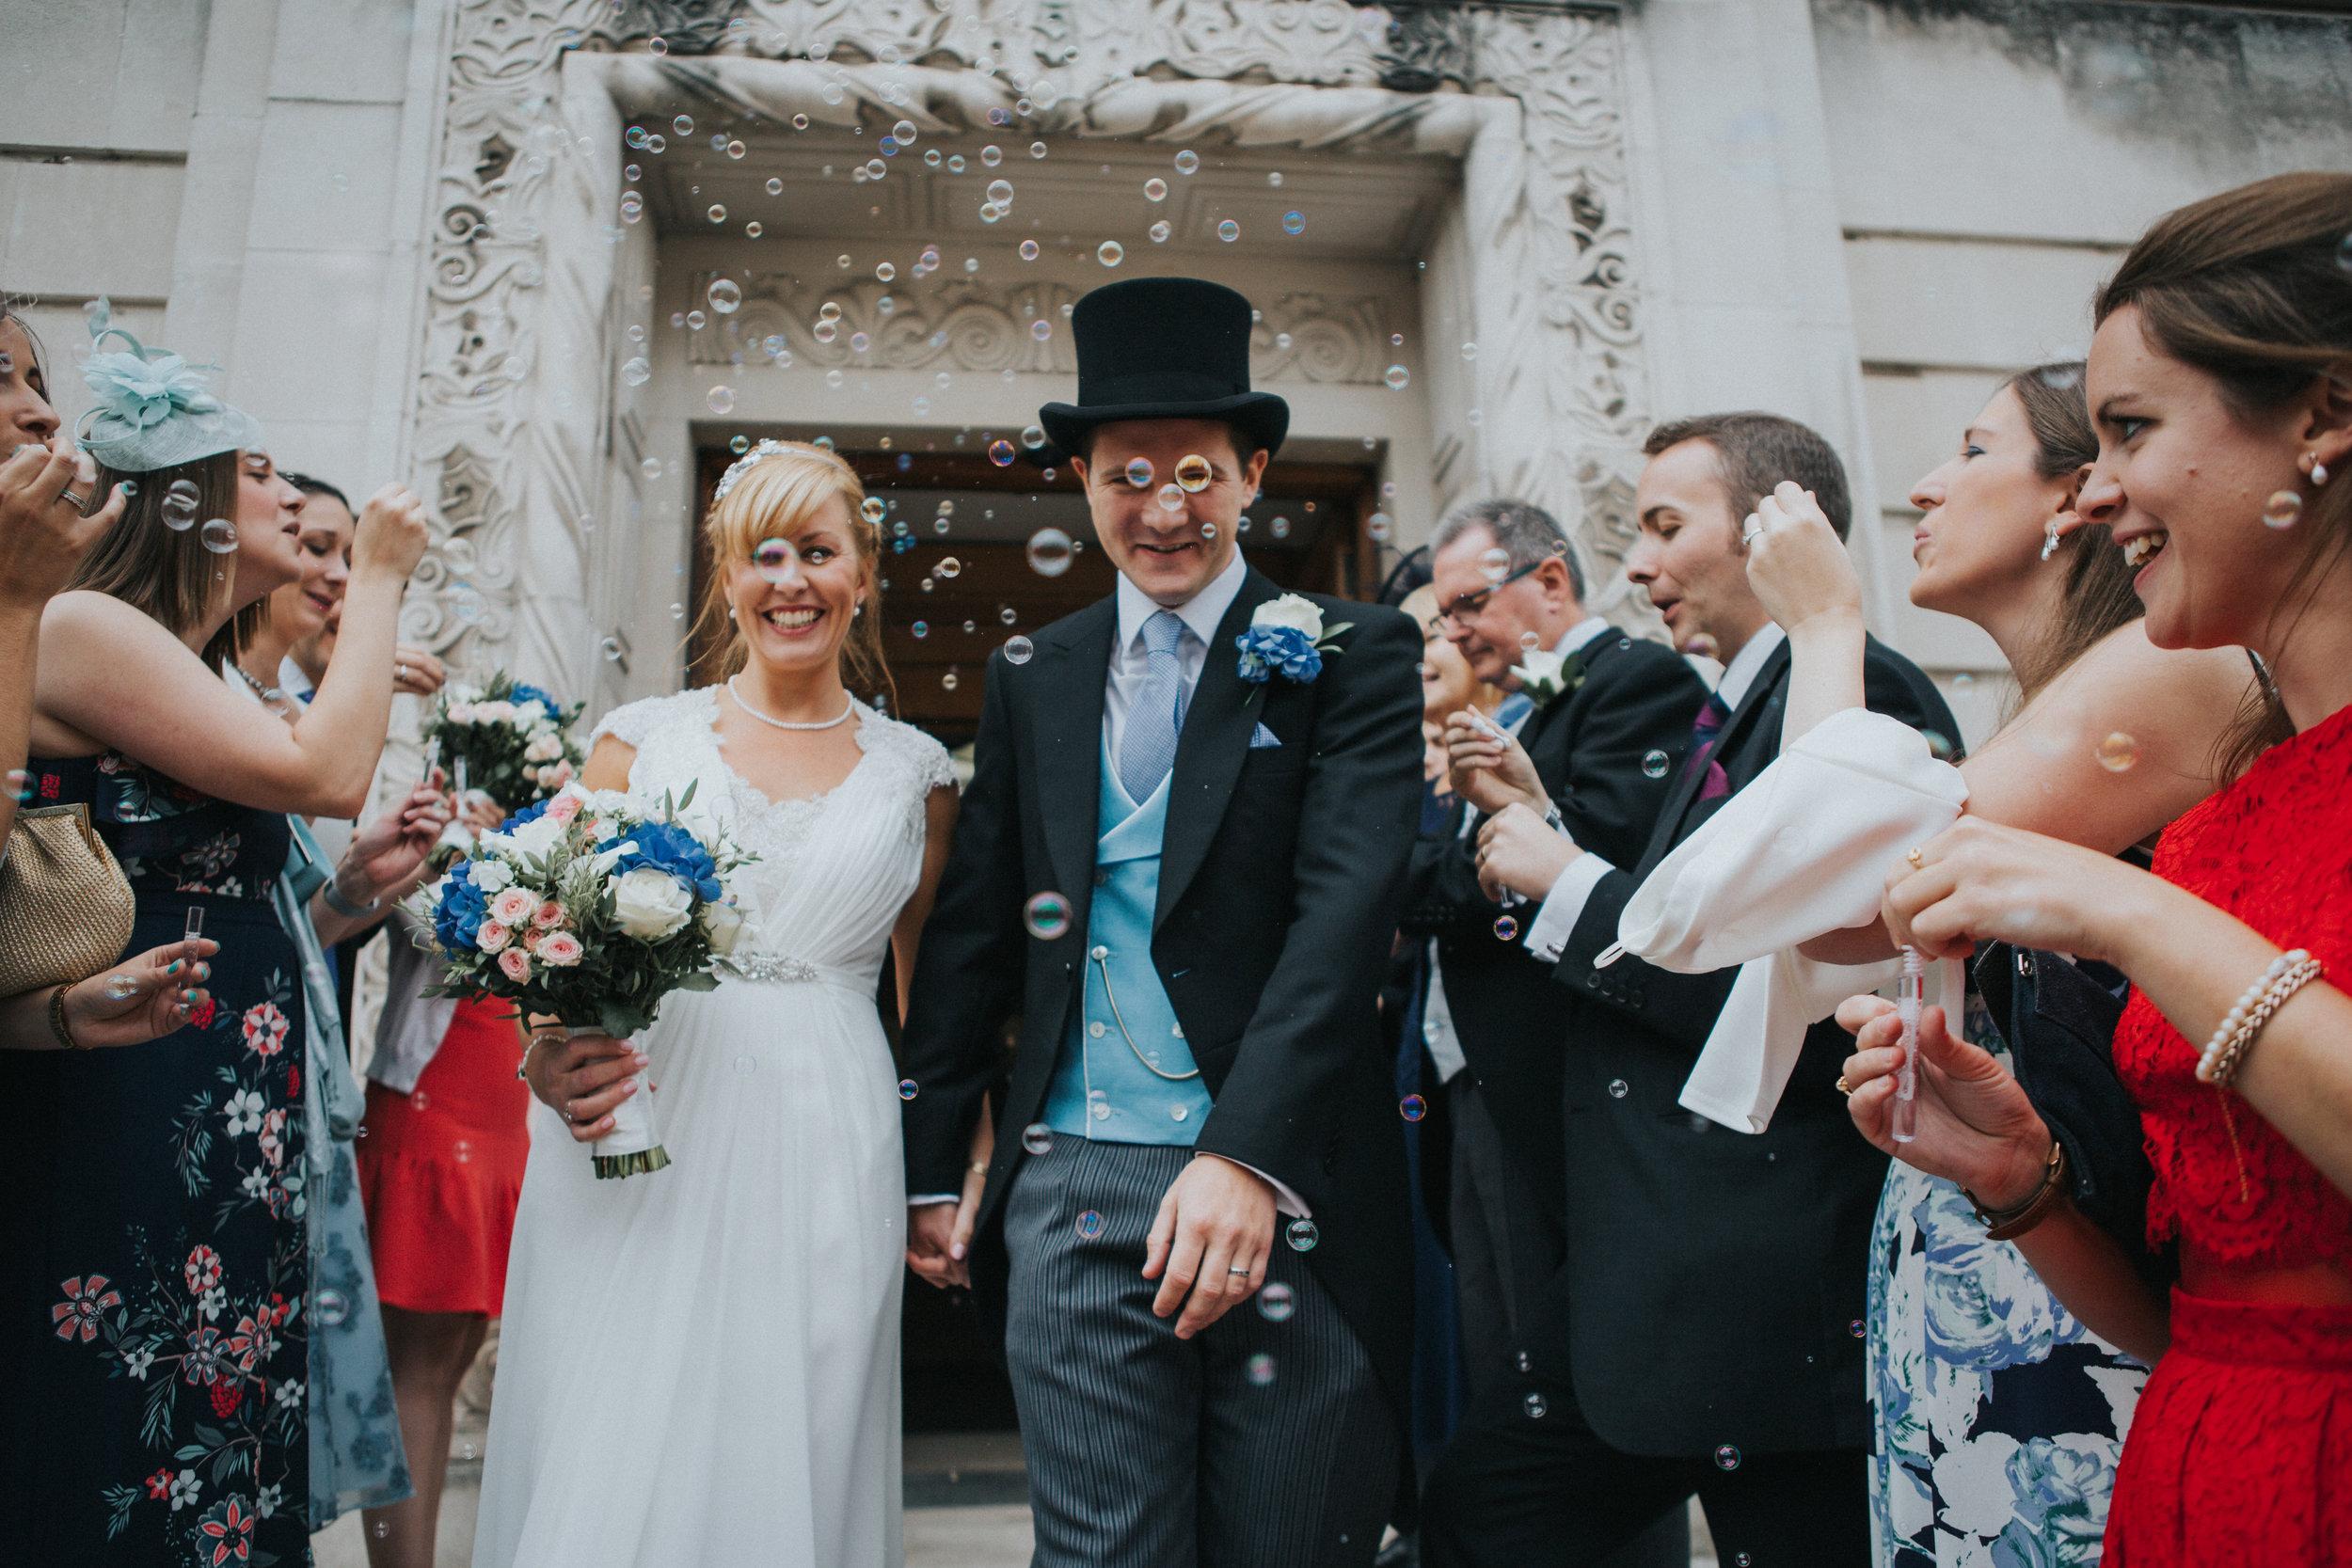 london-wedding-photography-wimbledon-wandsworth-town-hall-savoy-hotel-bubble-confetti-arch-51